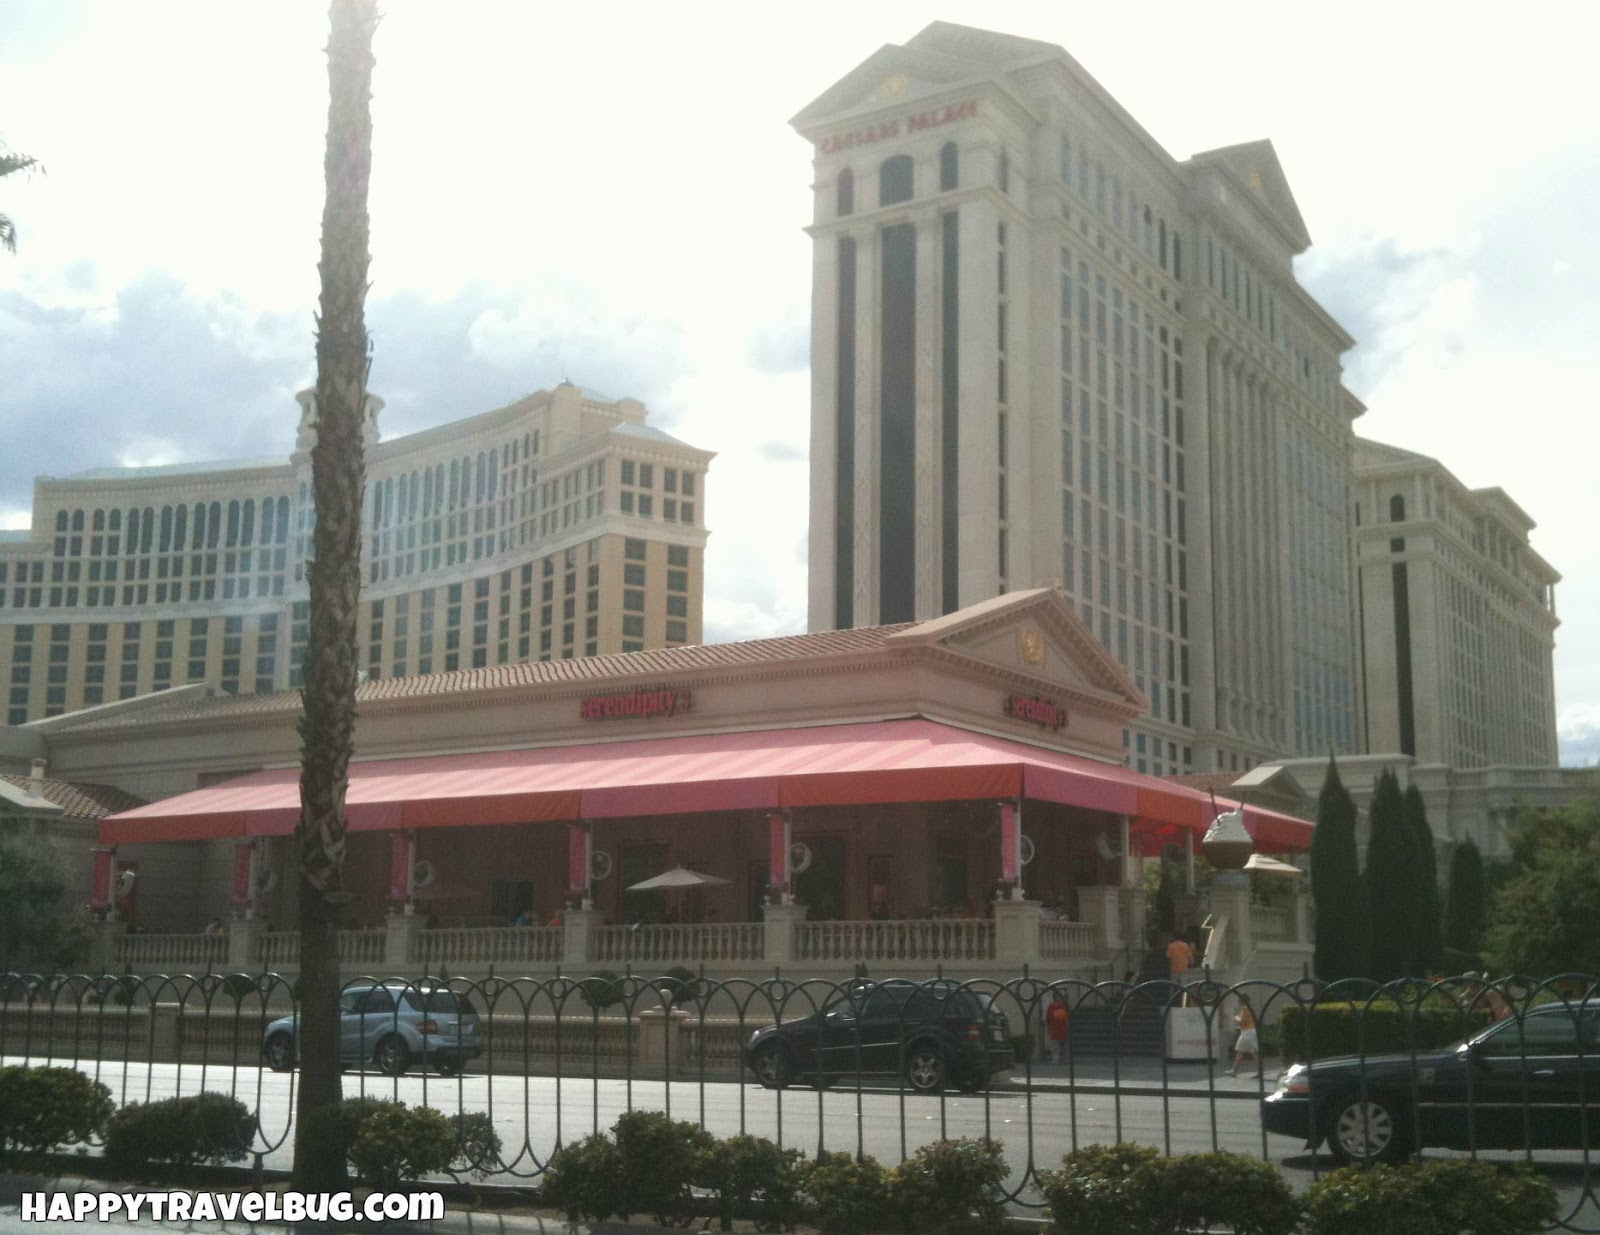 Serendipity 3 in Las Vegas